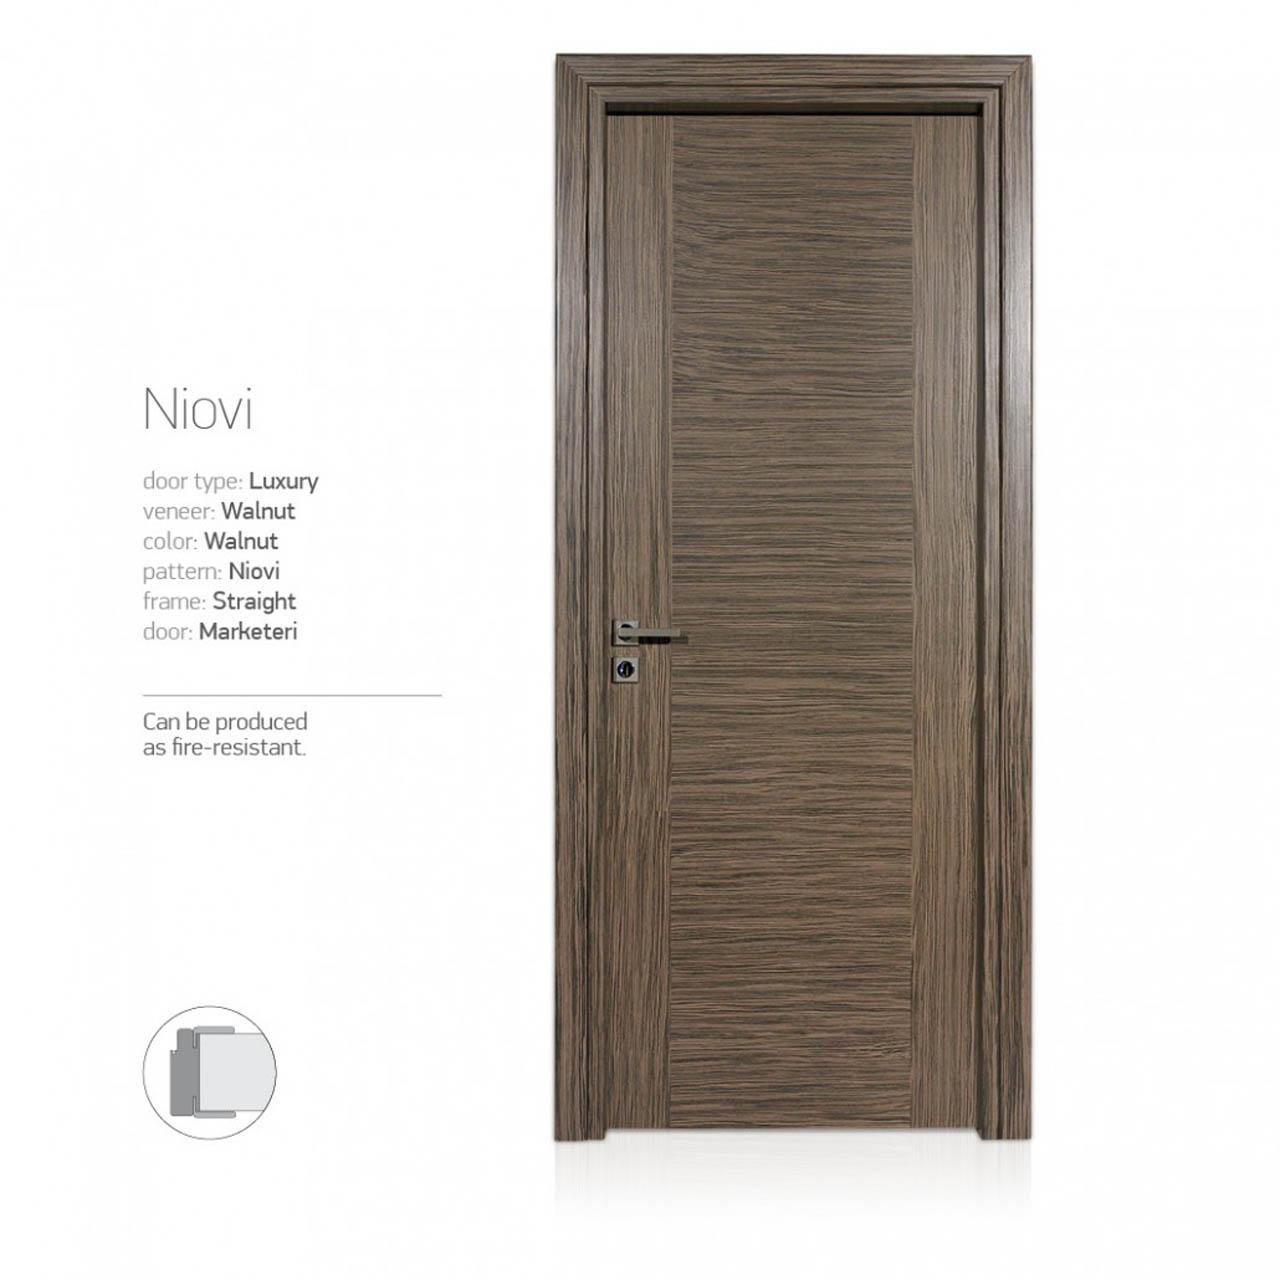 portes-site-luxury-eng13-1030x1030